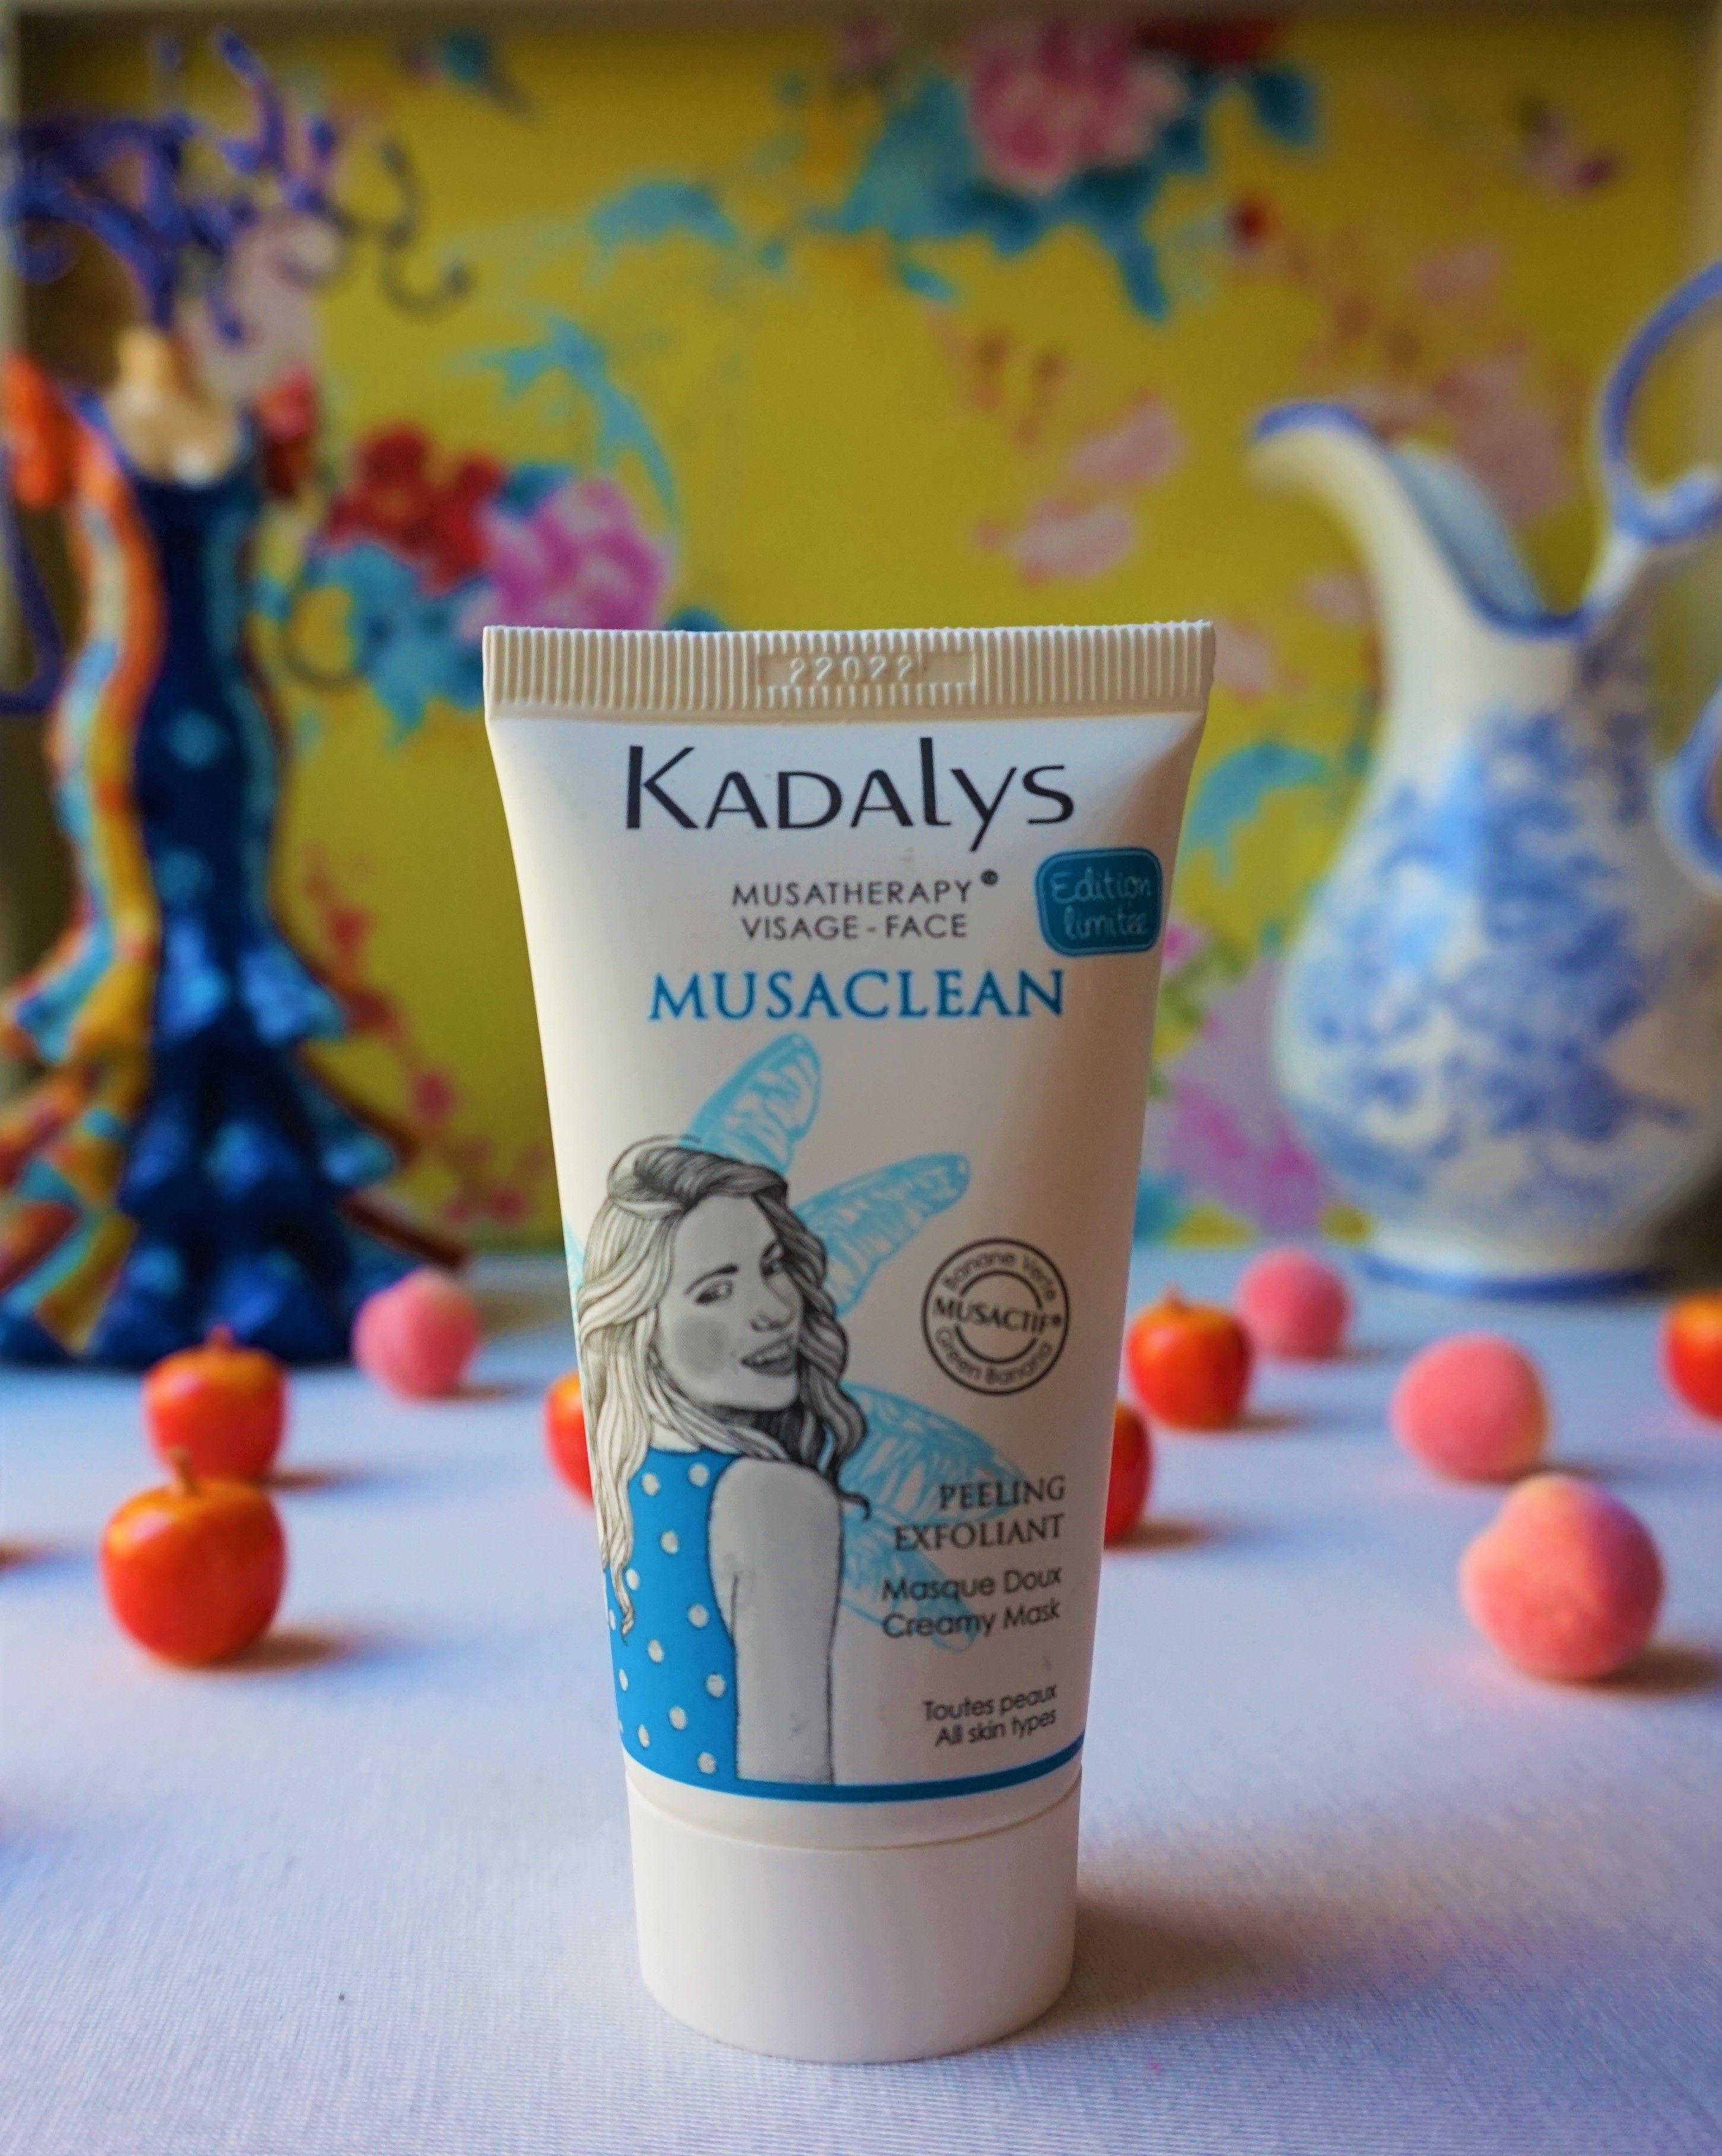 Revue masque peeling exfoliant Musaclean de Kadalys #blogueuse #cosmetiques #kadalys #peeling #skincare